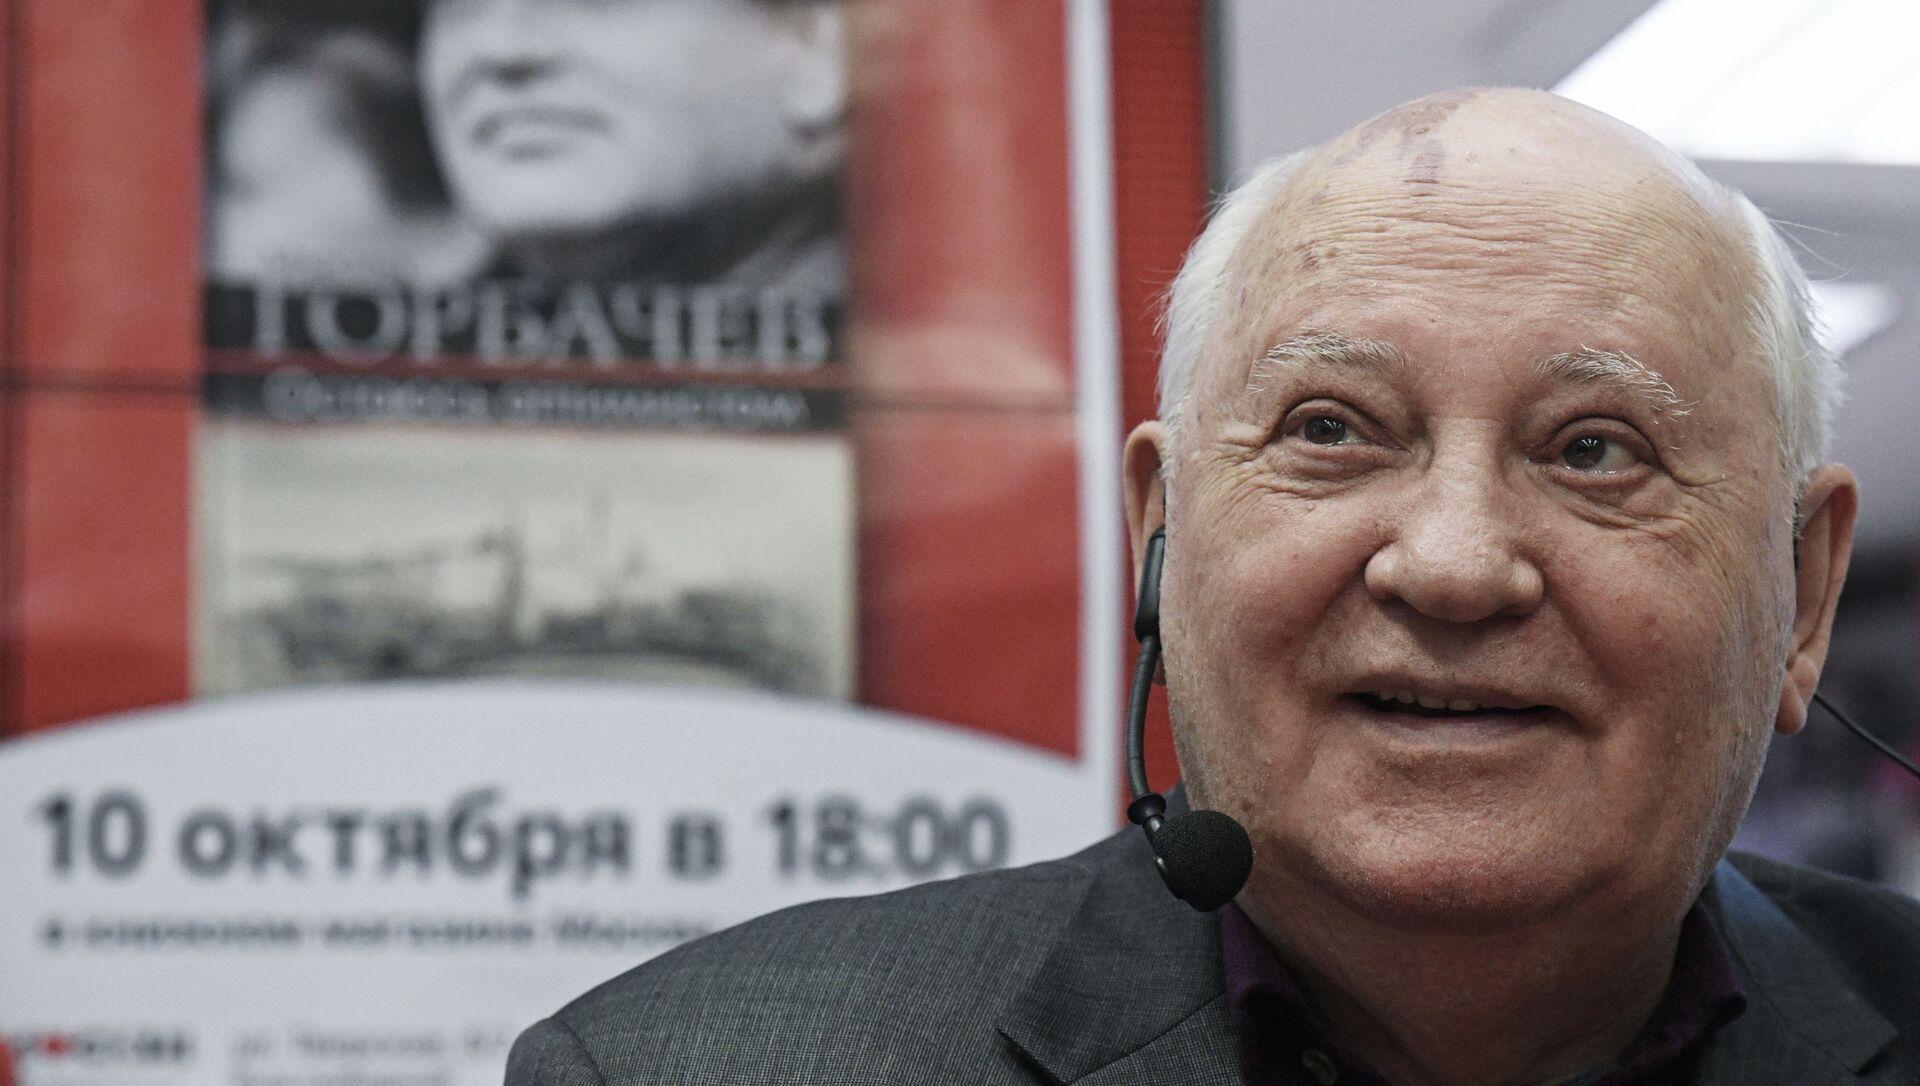 L'ex presidente dell'URSS Mikhail Gorbaciov - Sputnik Italia, 1920, 02.03.2021